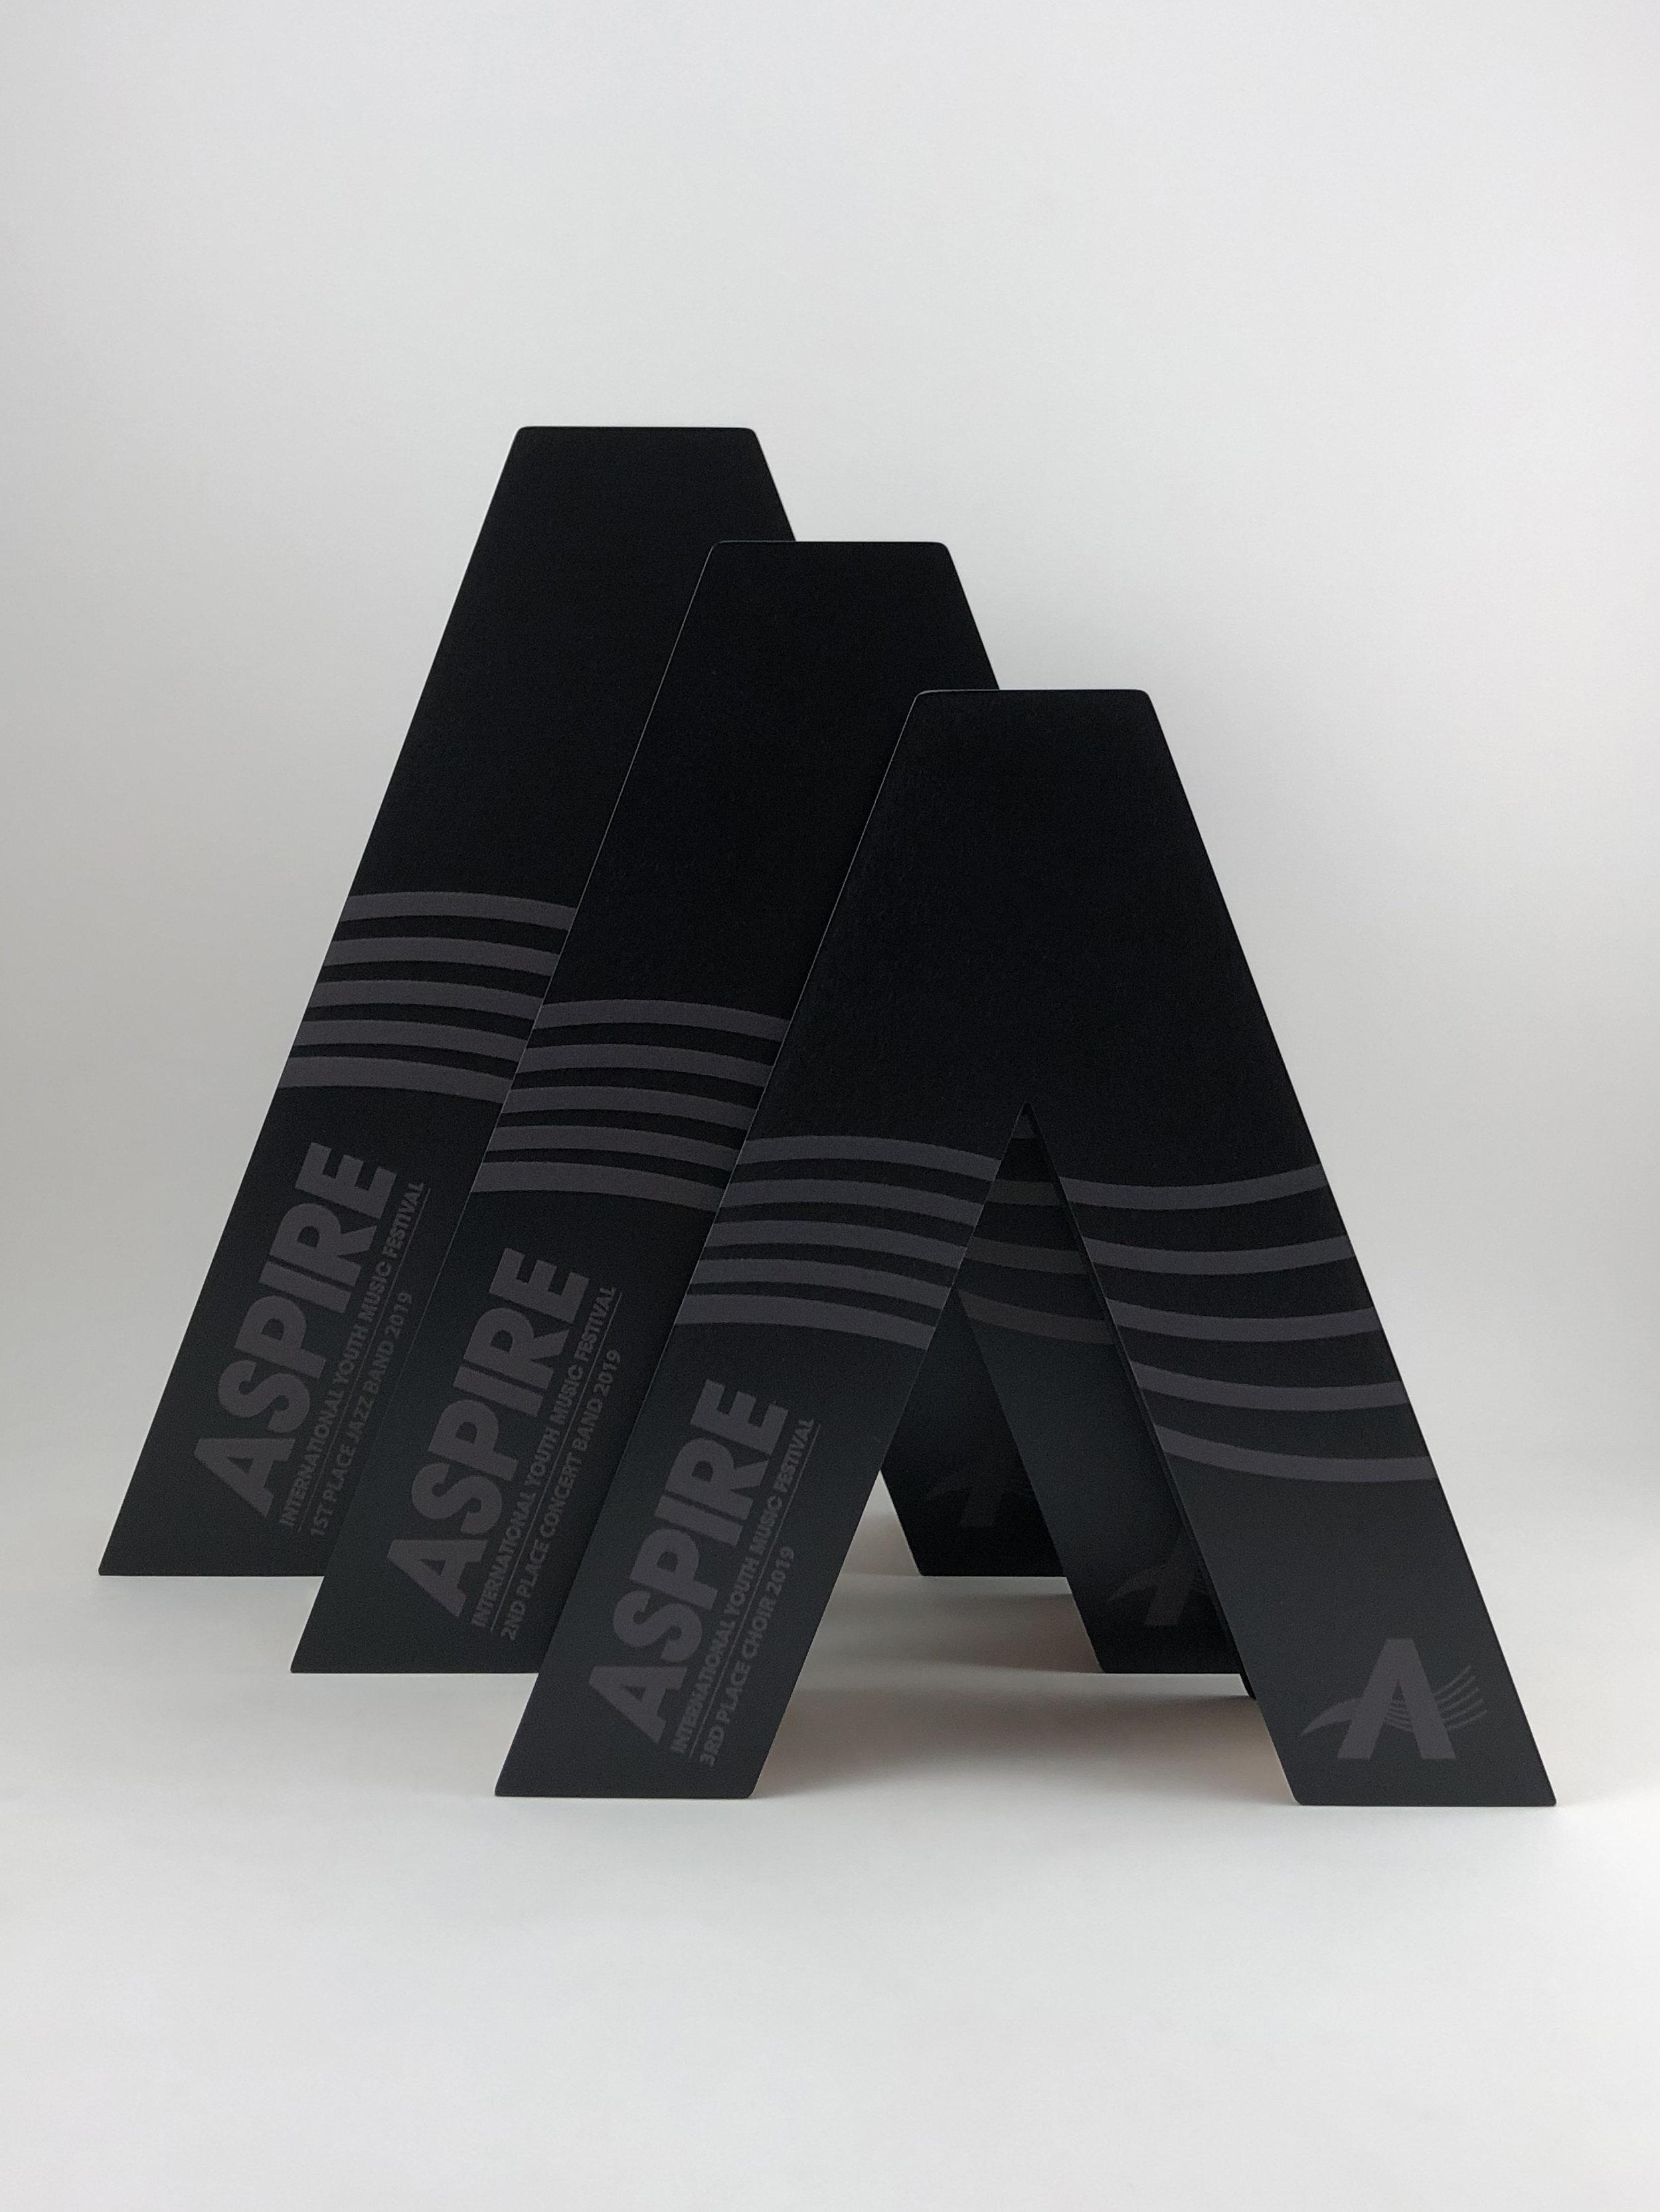 aspire-international-youth-music-festival-timber-metal-eco-trophy-awards-06.jpg